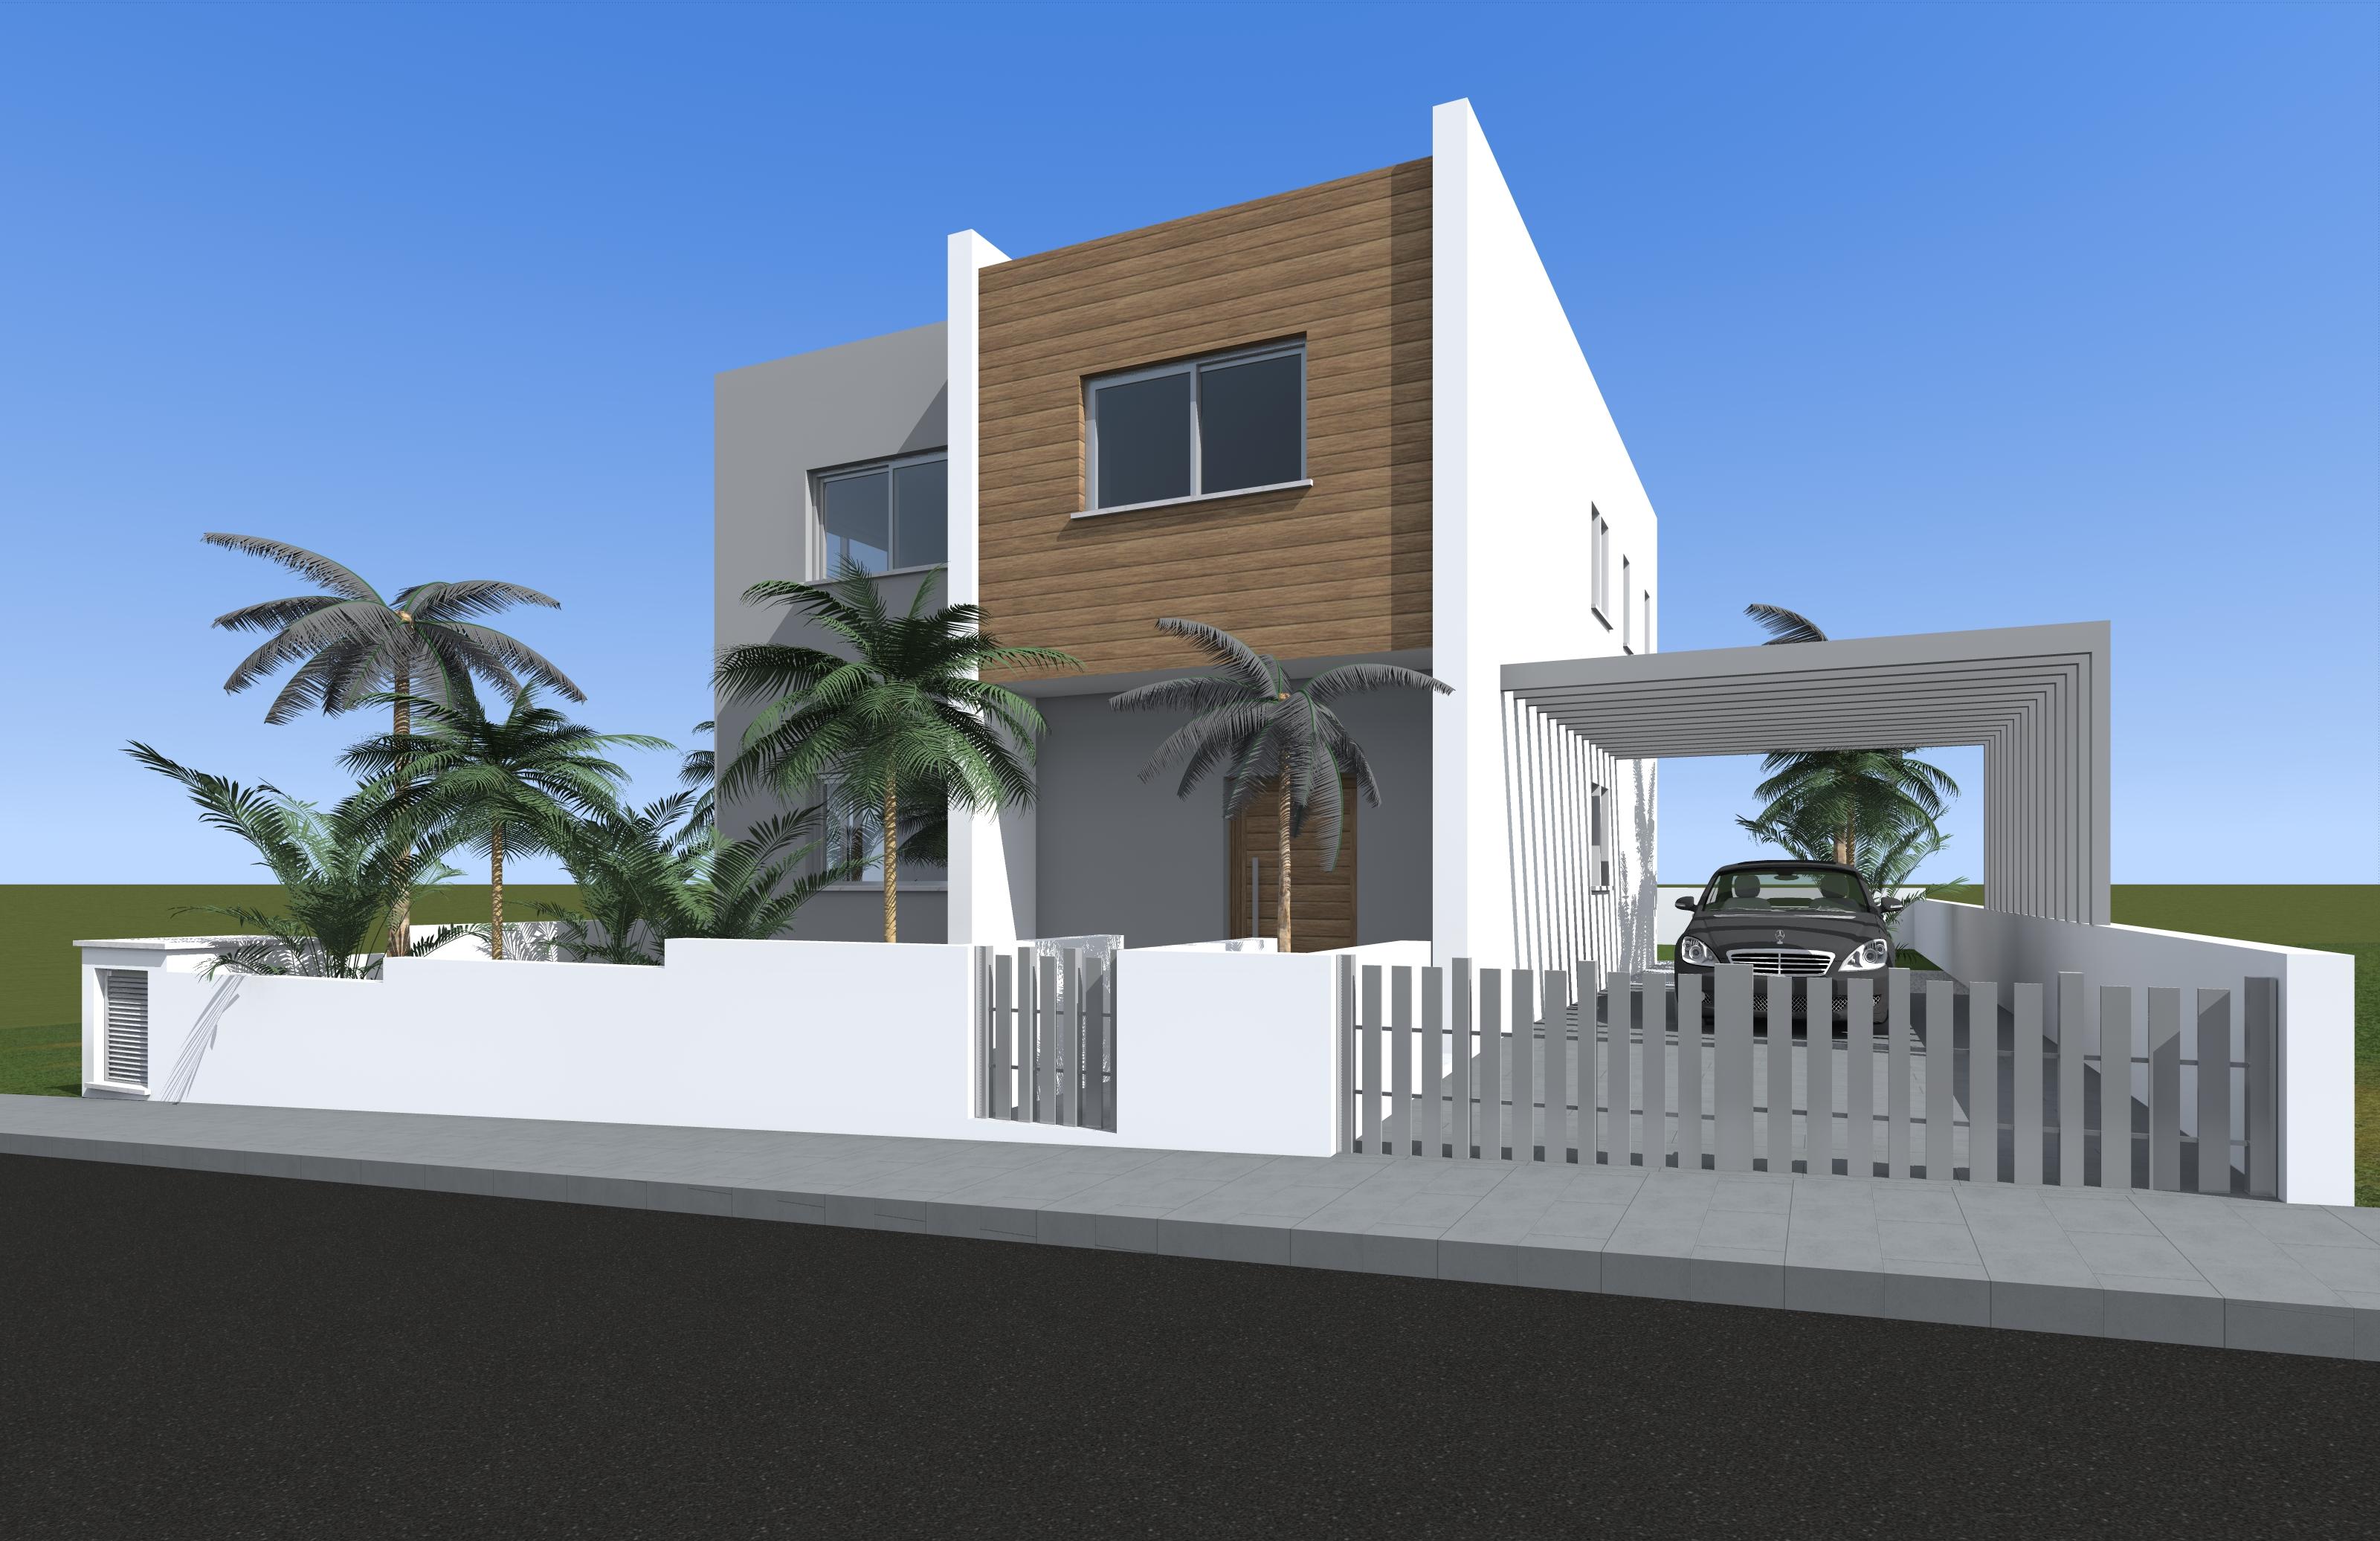 ZENITH HOUSE A